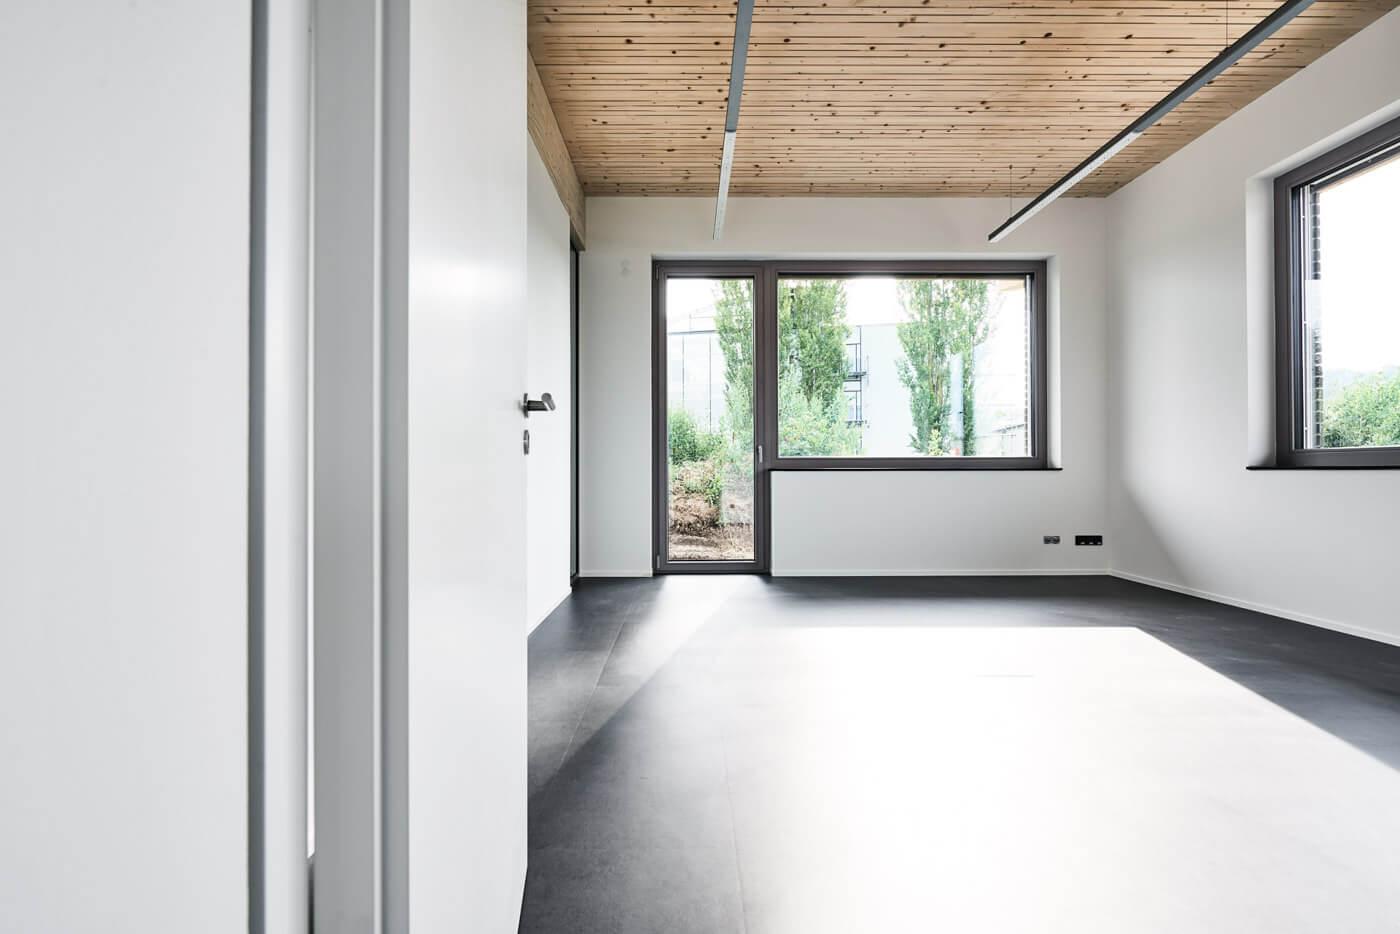 Büro mit Terrassenzugang